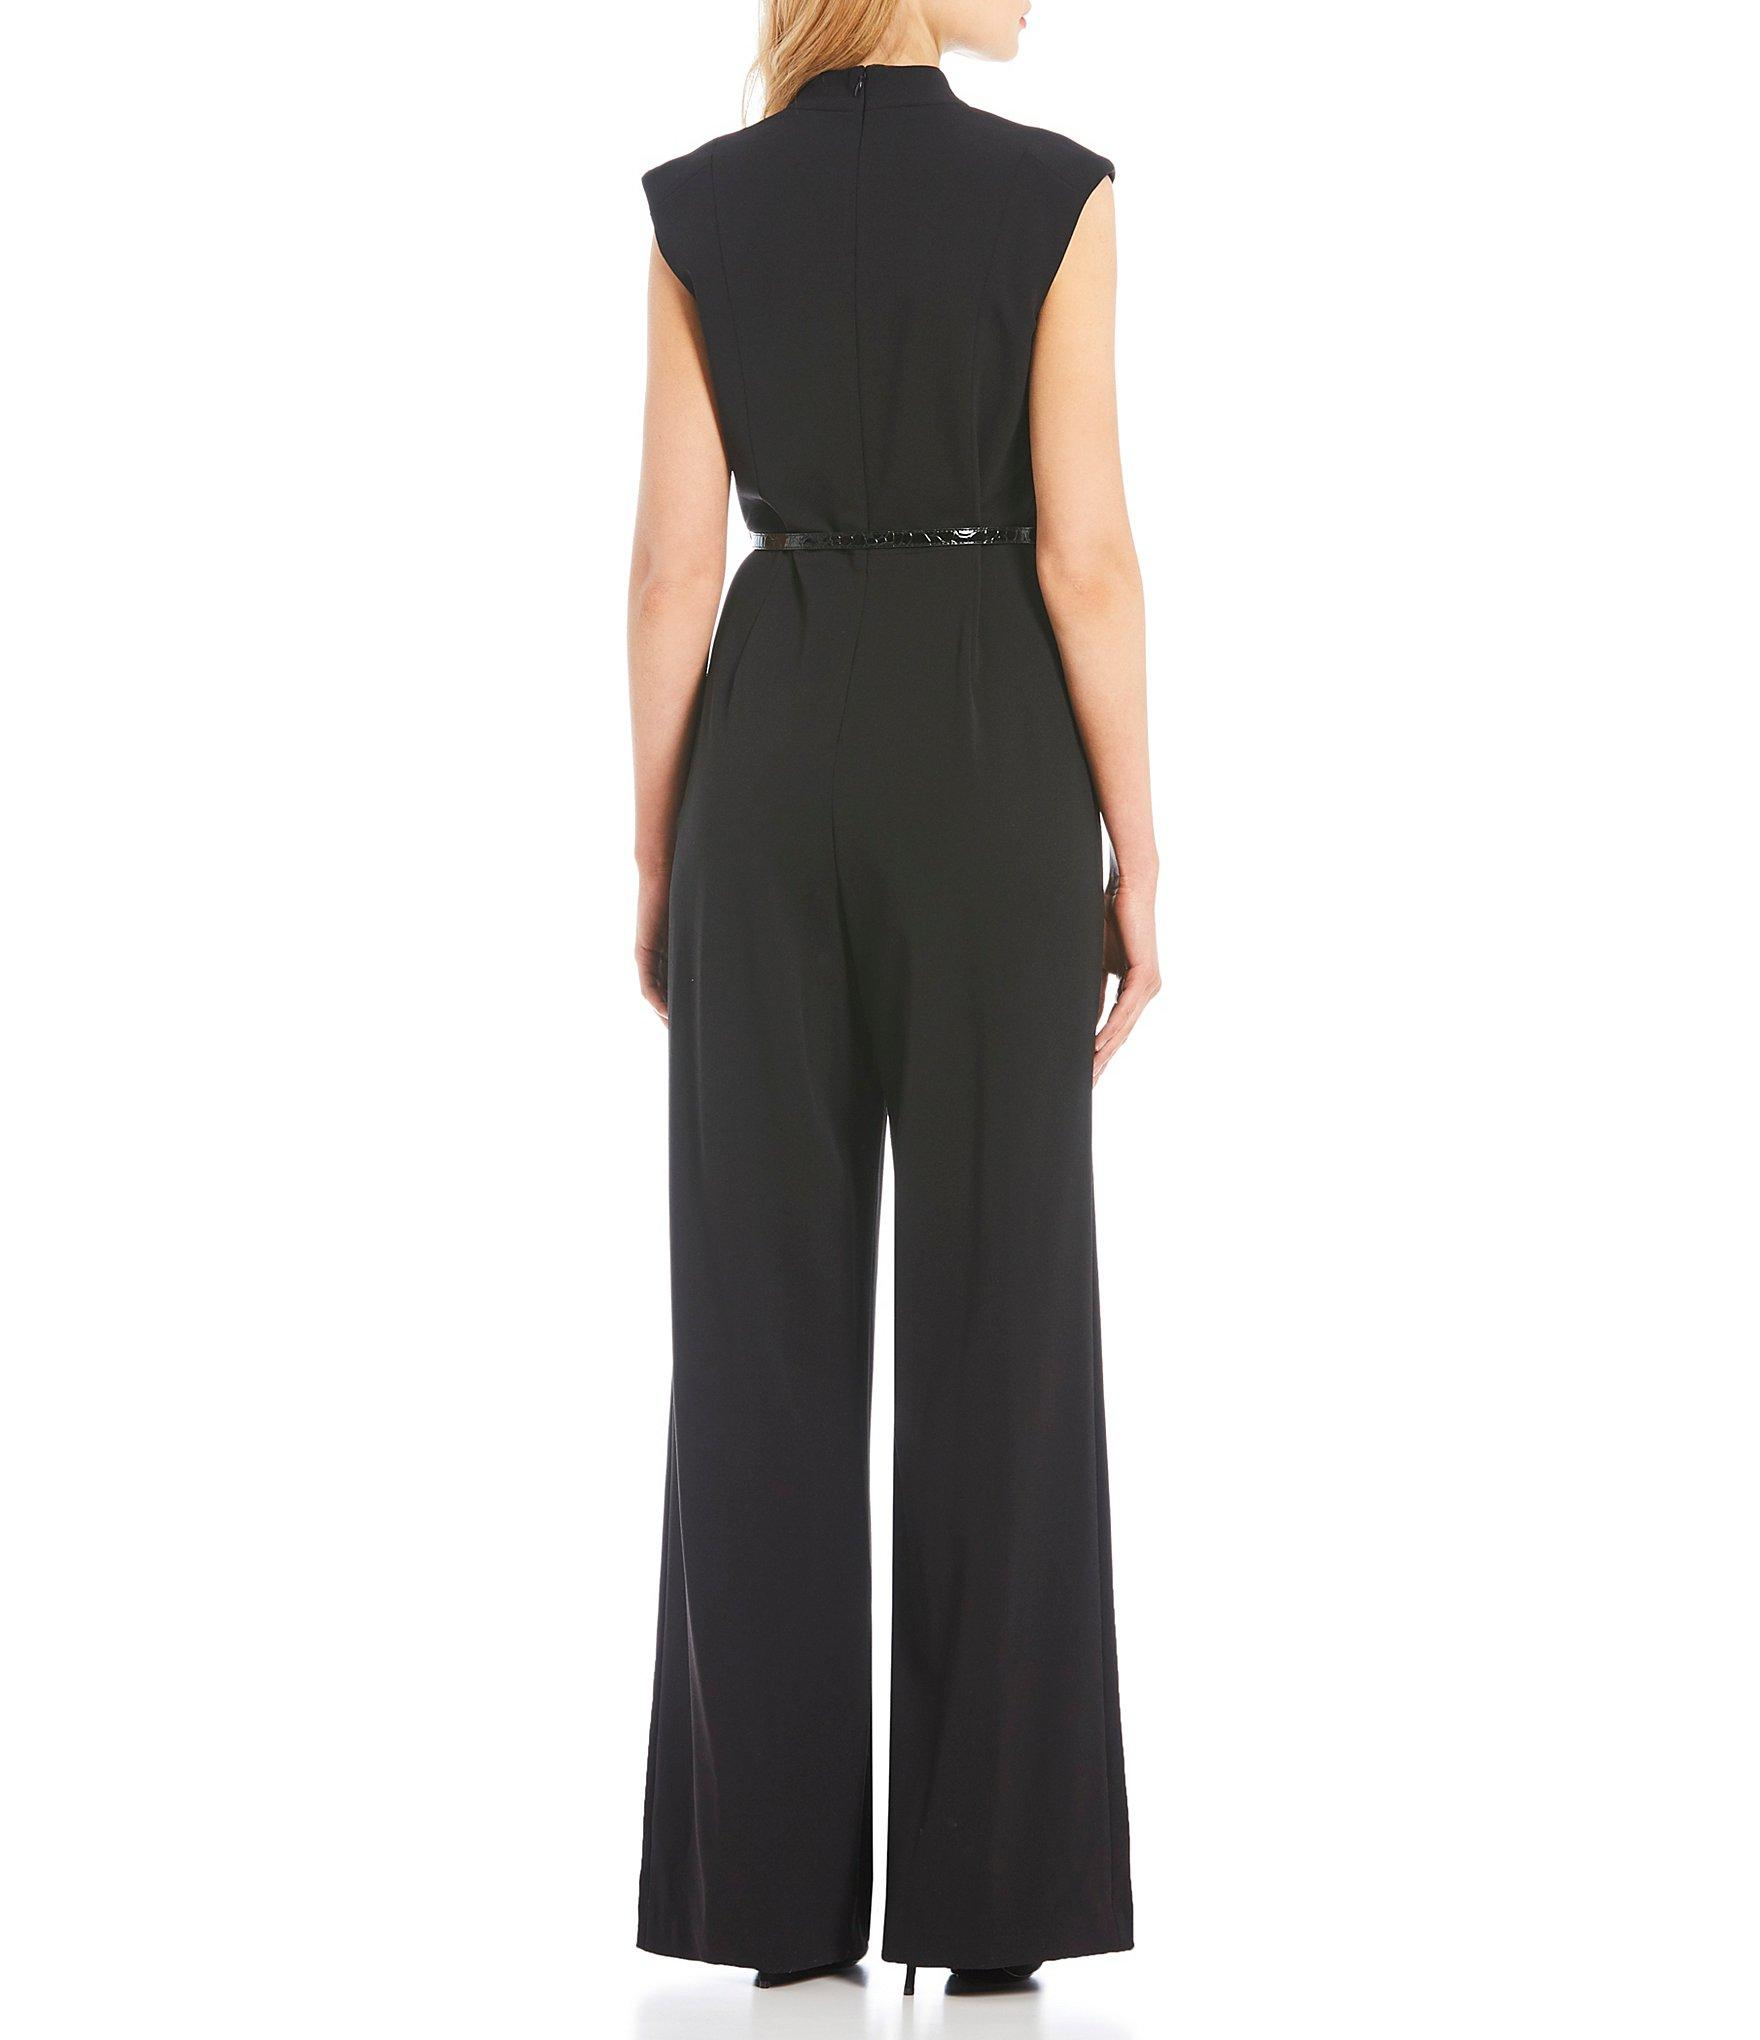 d93bef7317d Lyst - Calvin Klein Surplice V-neck Cap Sleeve Belted Jumpsuit in Black